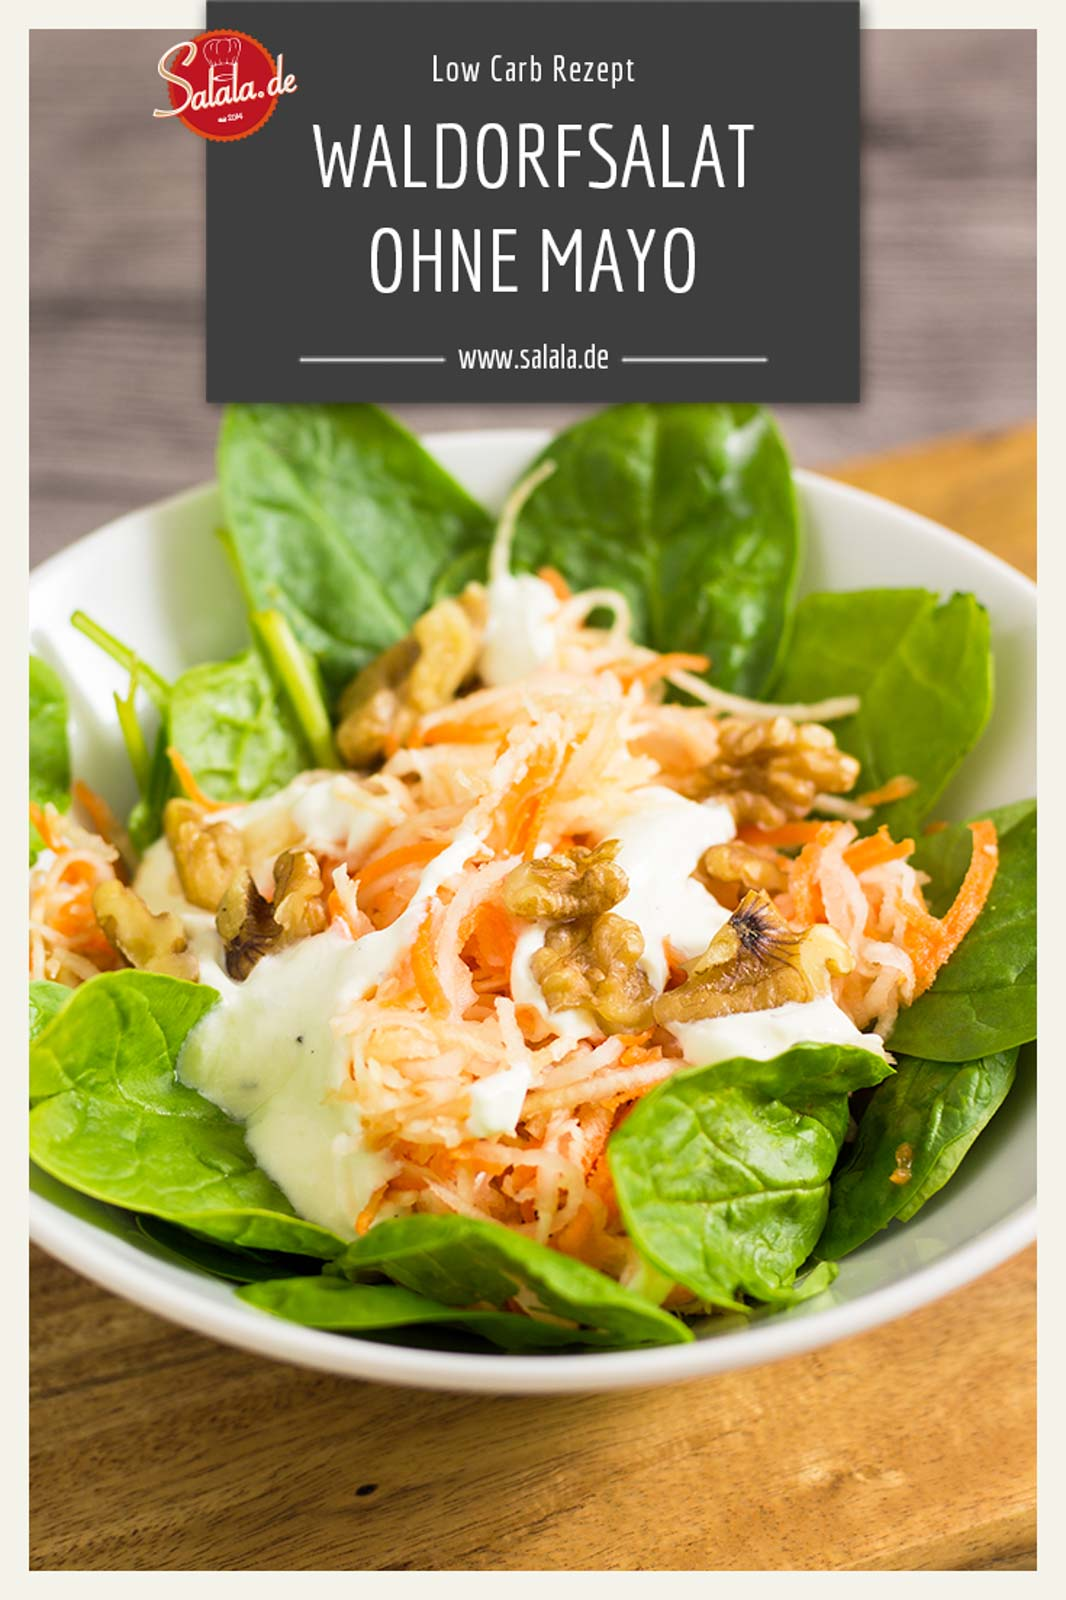 Waldorfsalat Rezept - by salala.de - Low Carb selber machen ohne Mayonnaise mit Karotten #lowcarb #lowcarbsalat #lowcarbrezepte #salat #waldorfsalat